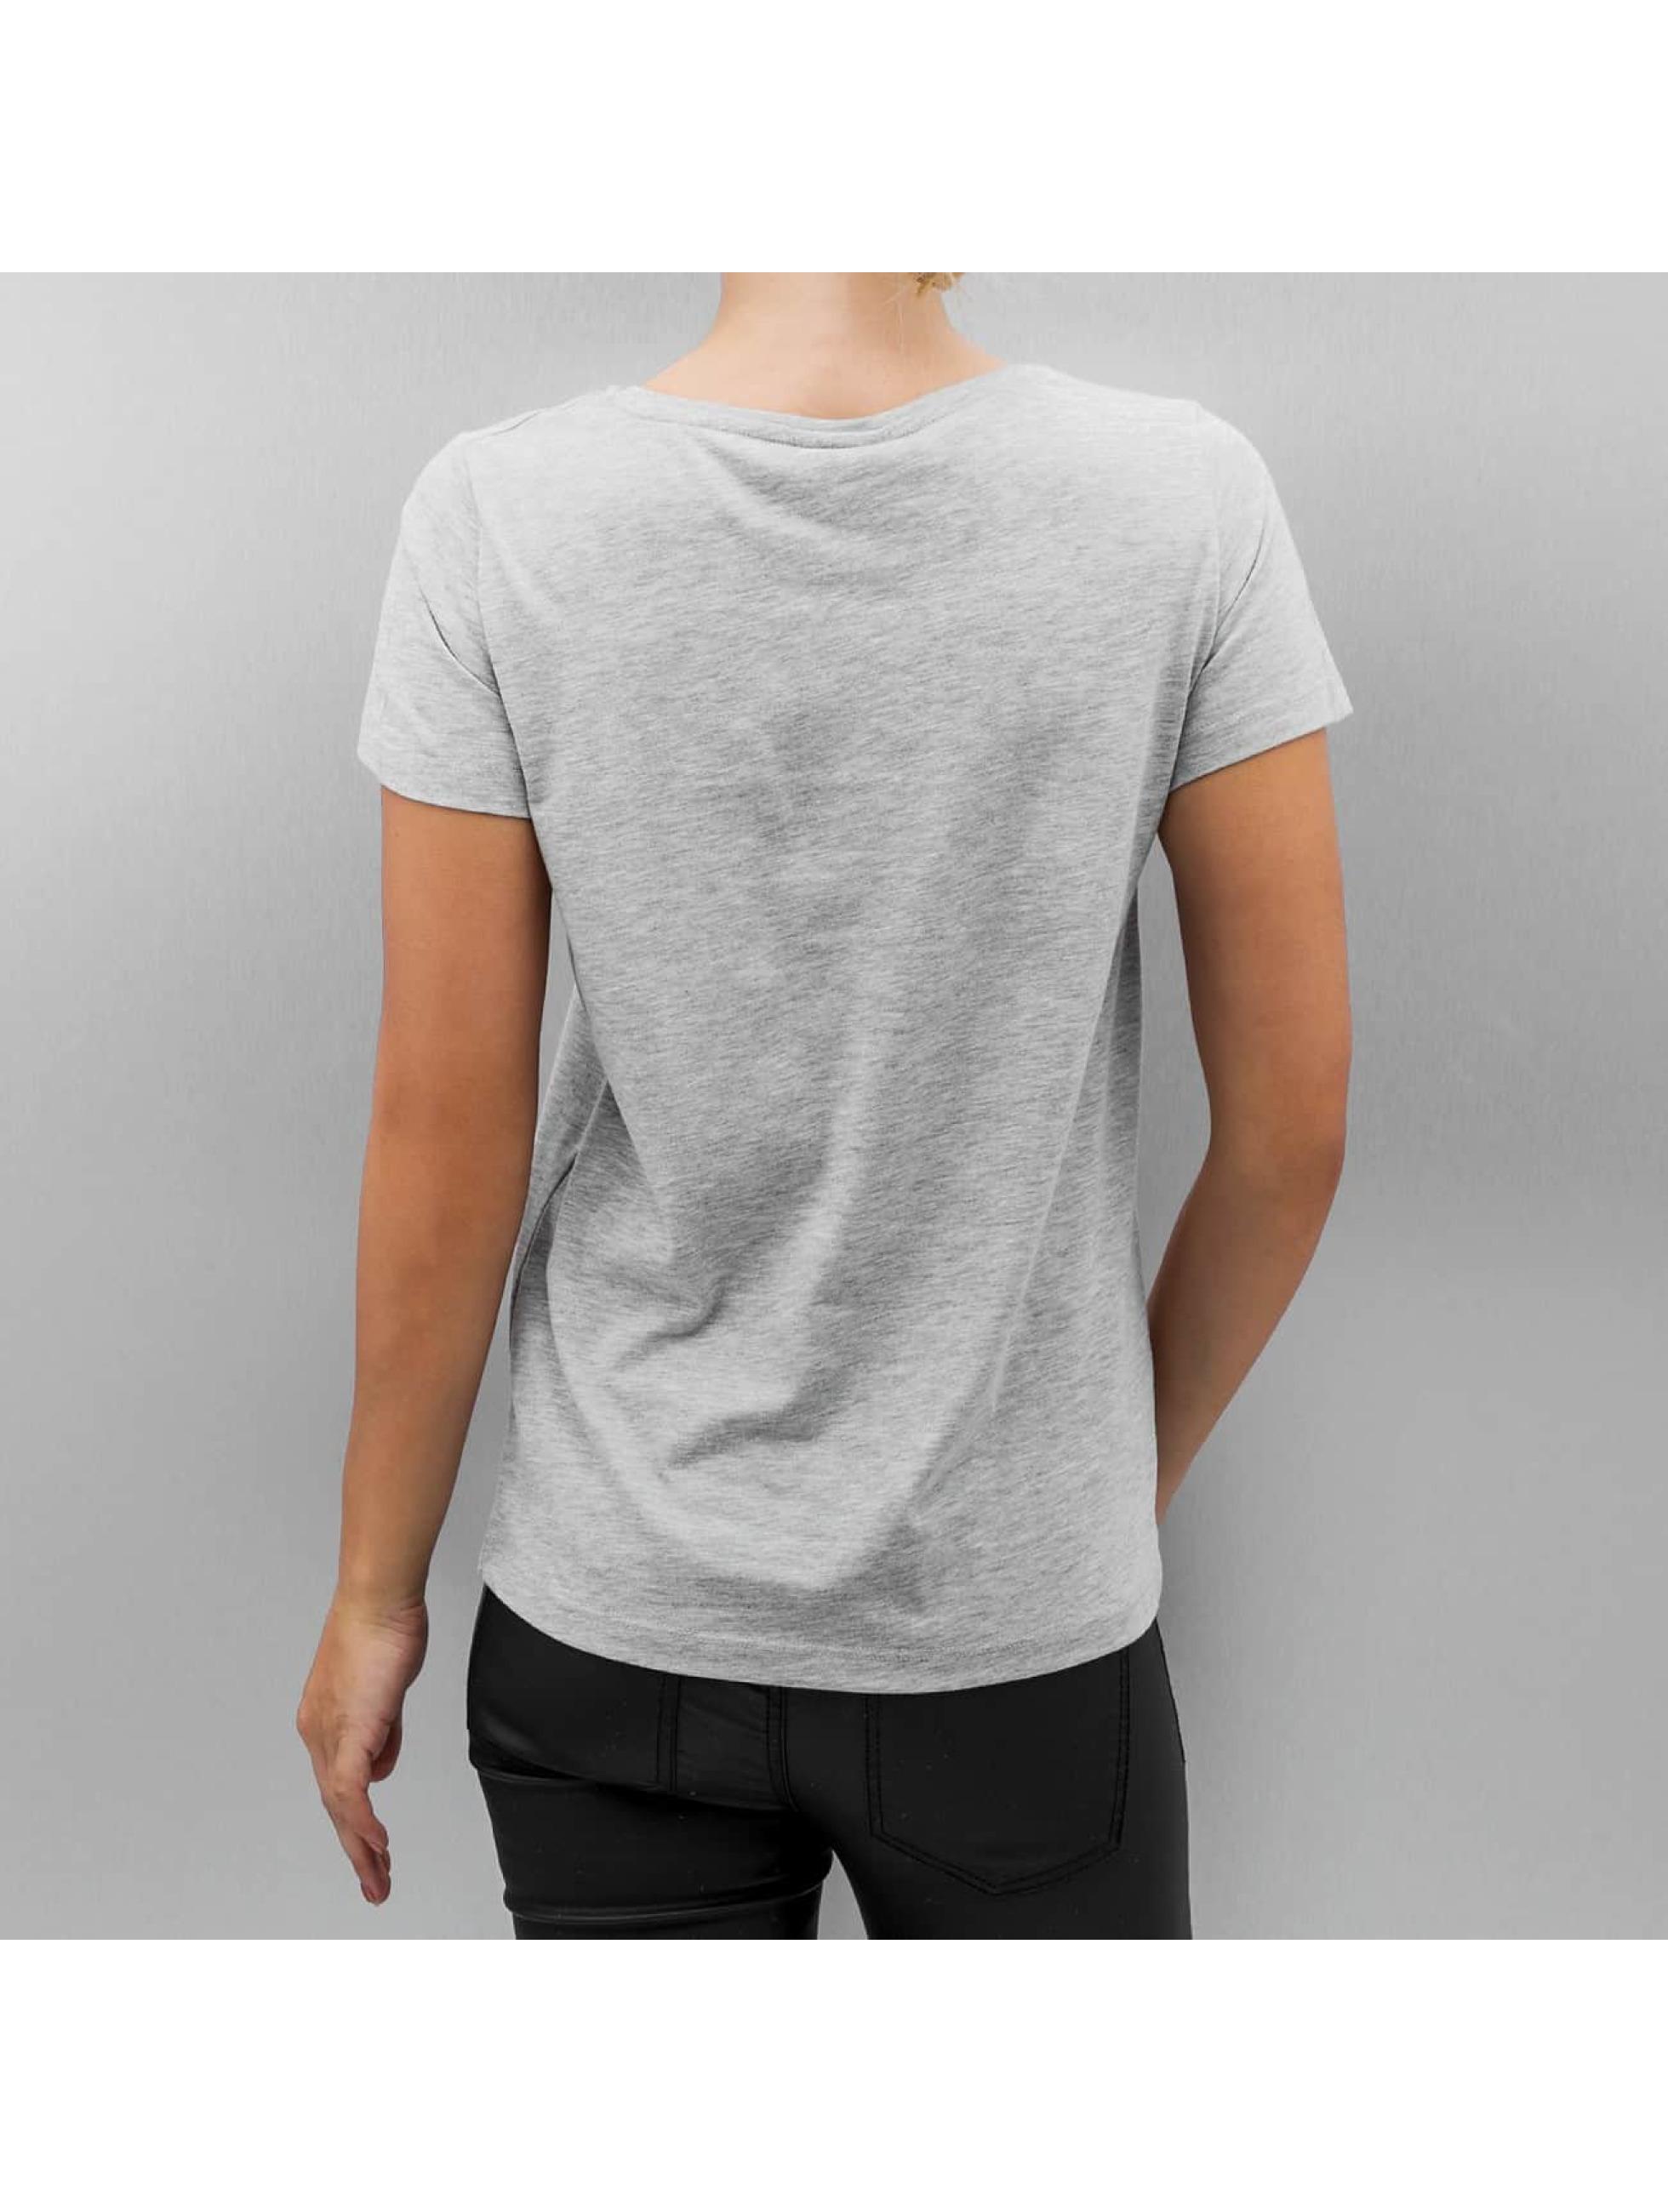 Vero Moda T-shirts VmMy grå